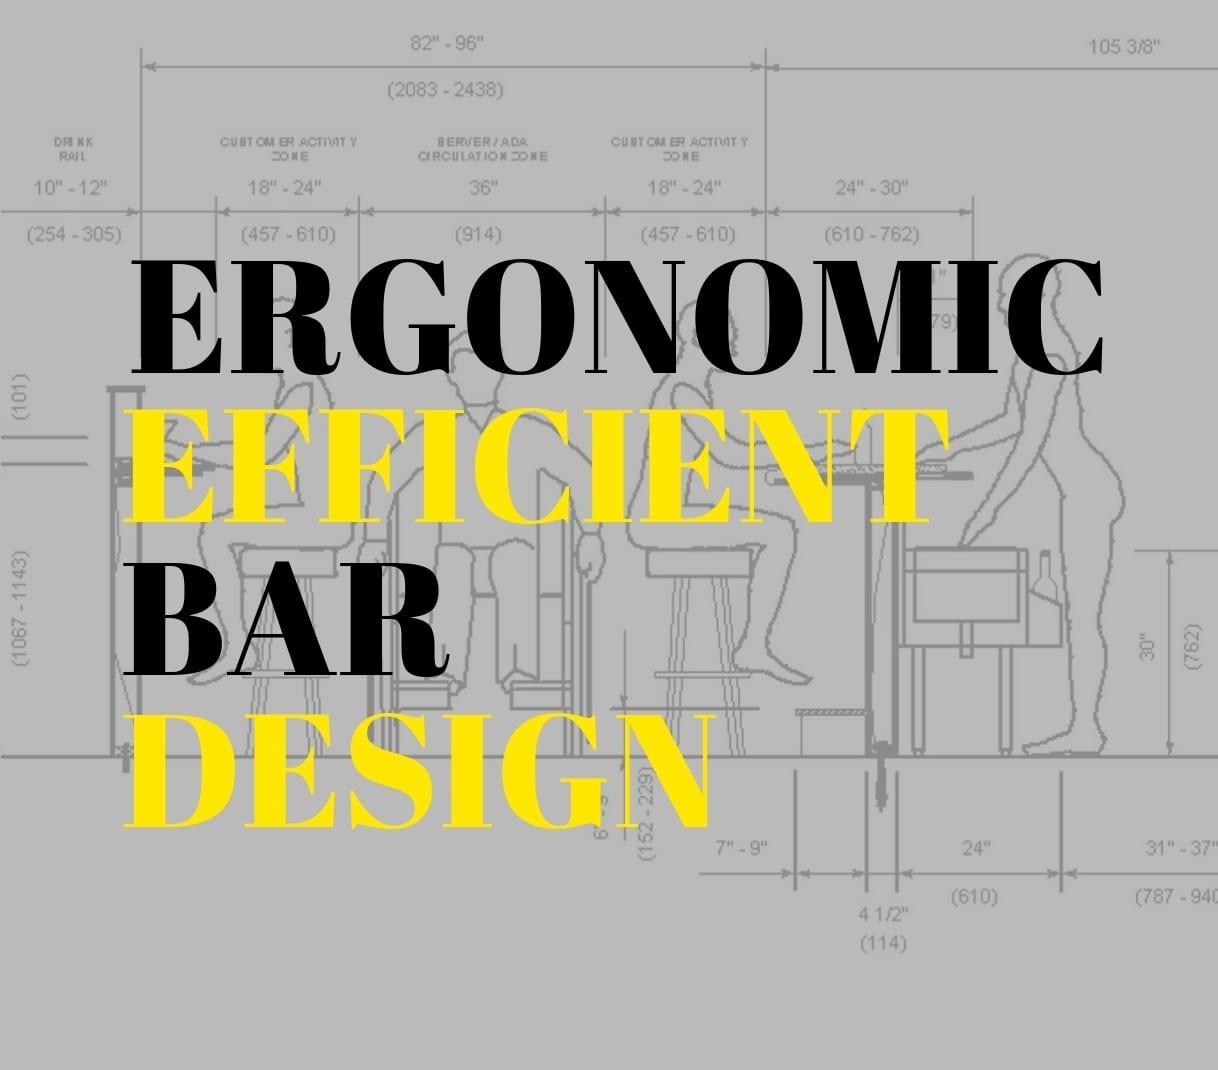 Incorporating ergonomics into bar design maximizes profits